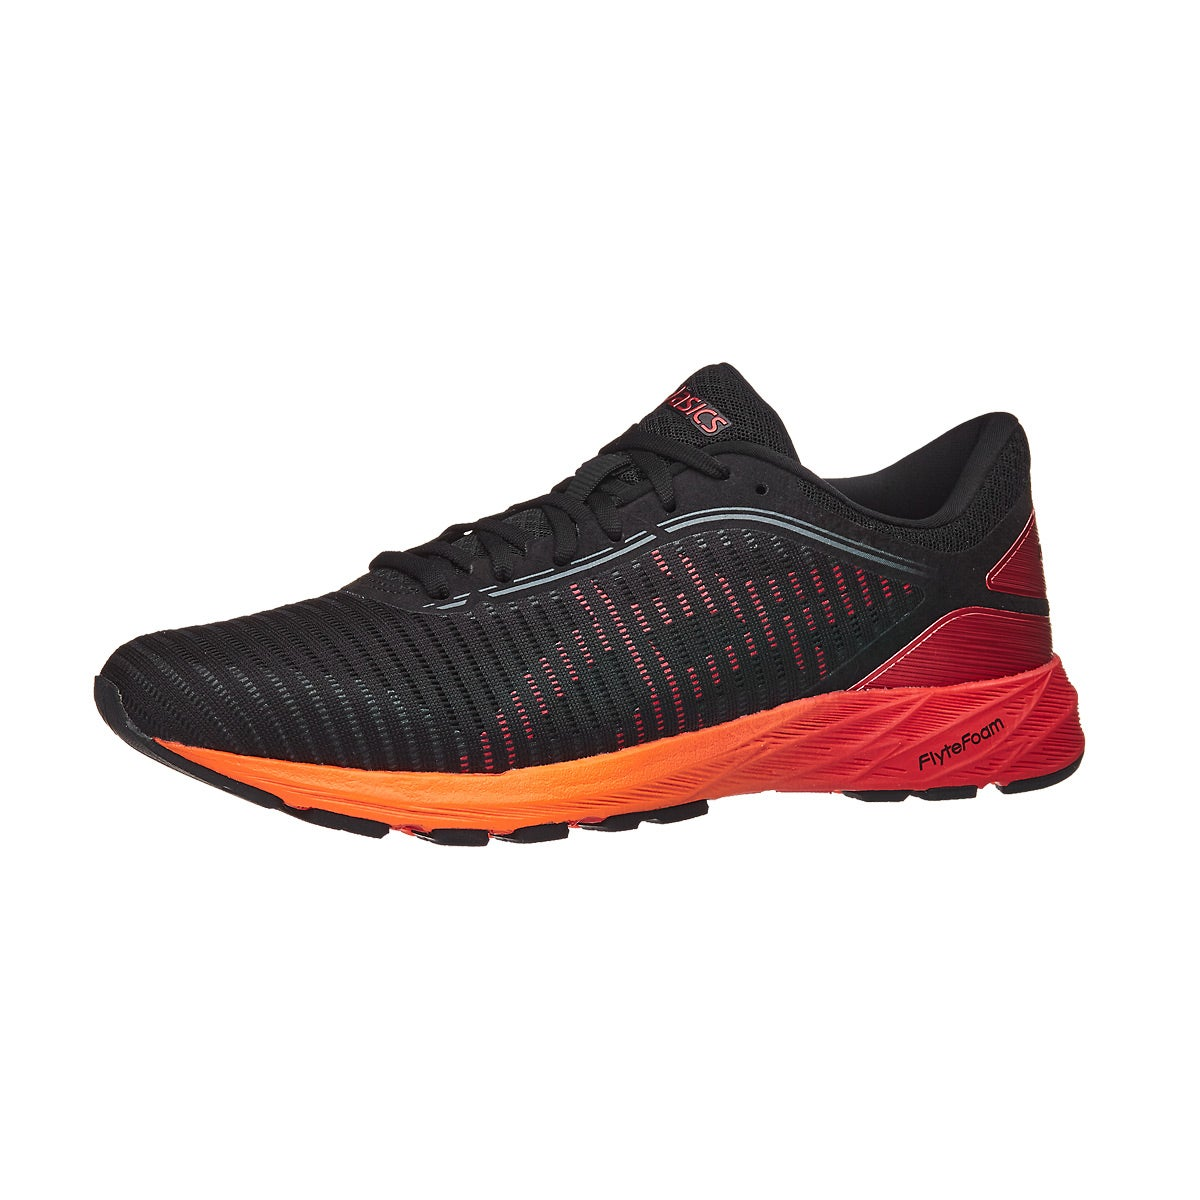 asics dynaflyte 2 men's shoes black/fiery red/orange